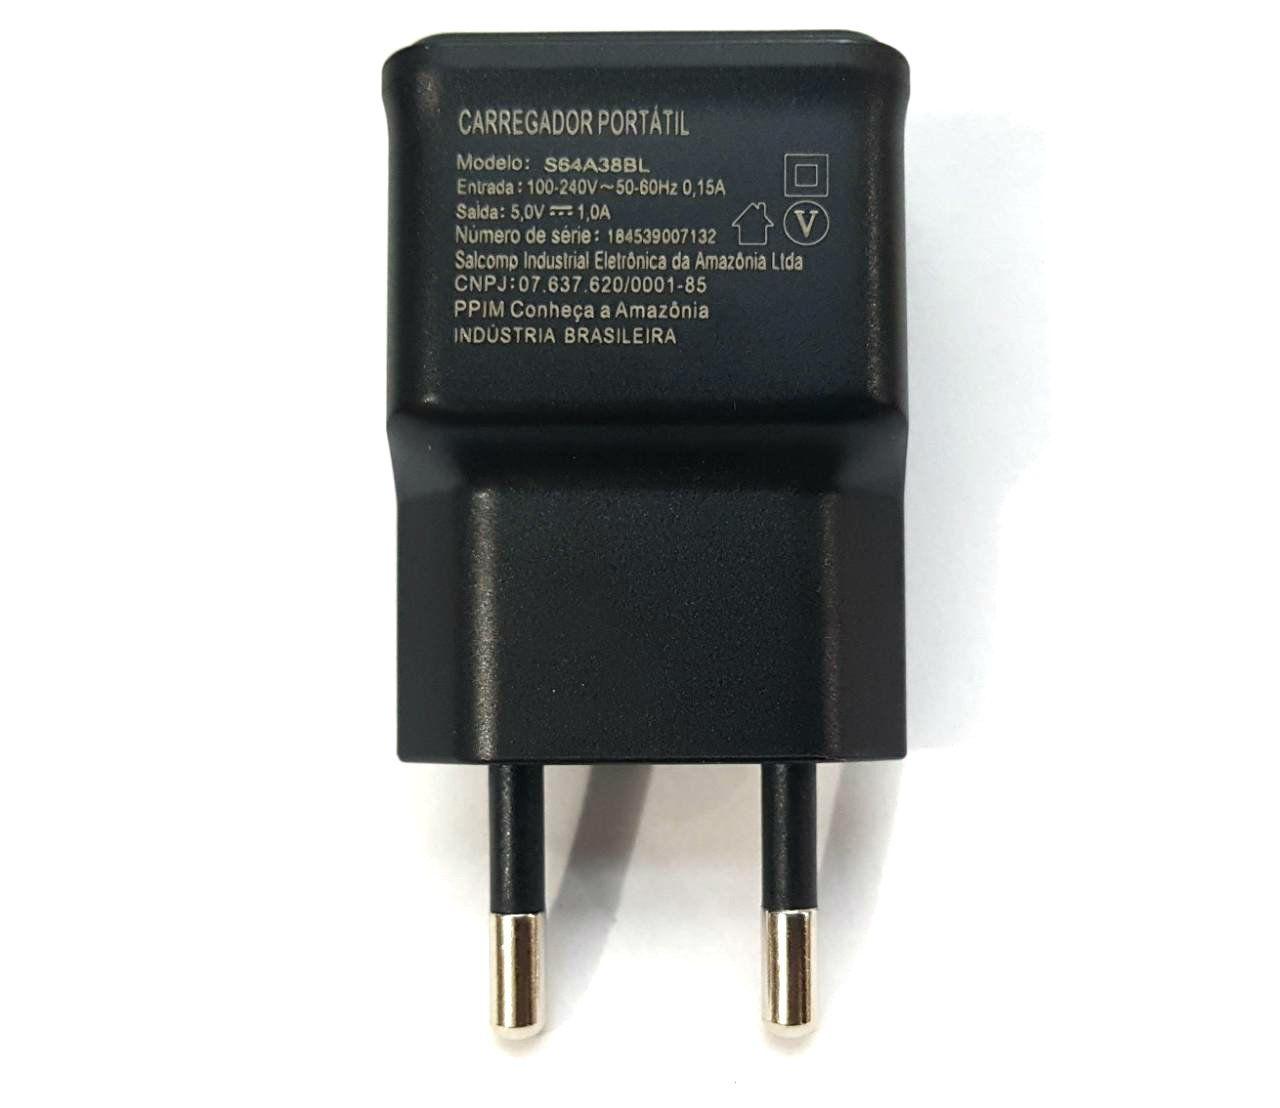 Fonte USB Parede 5V S64A38BL Preto